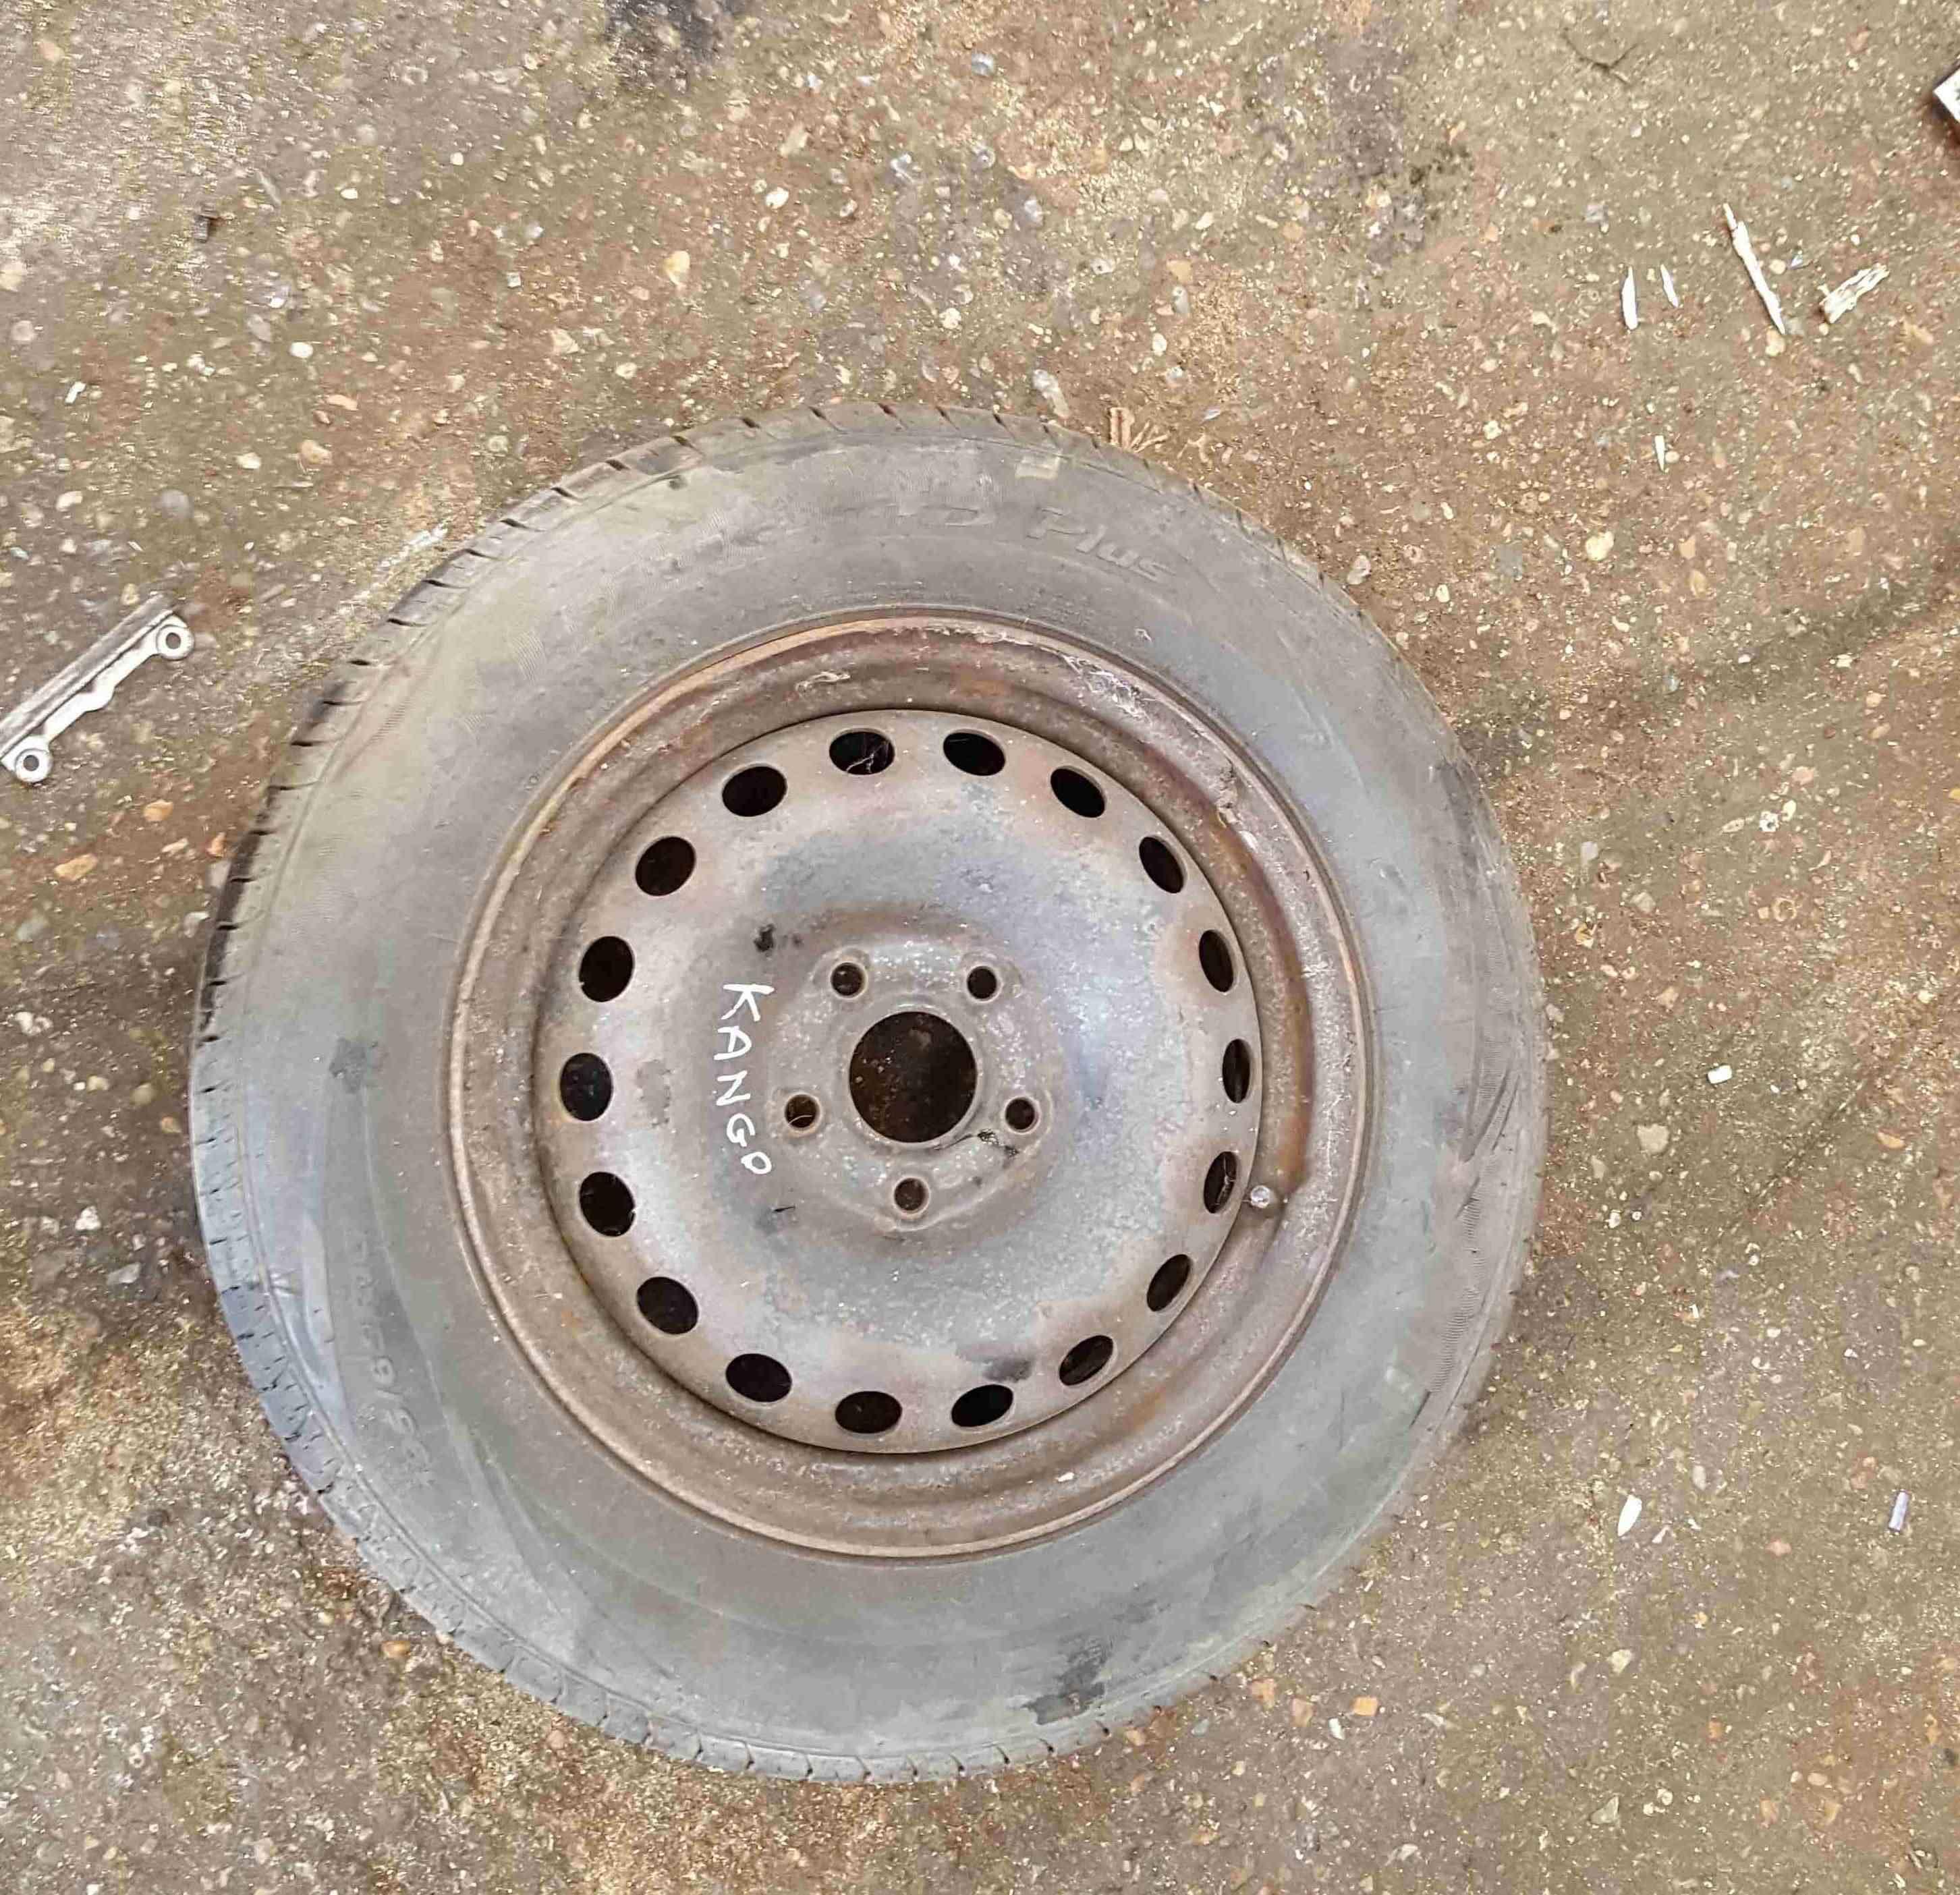 Renault Kangoo 2007-2013 Steel Wheel Rim + Tye 195 65 15 5mm Tread